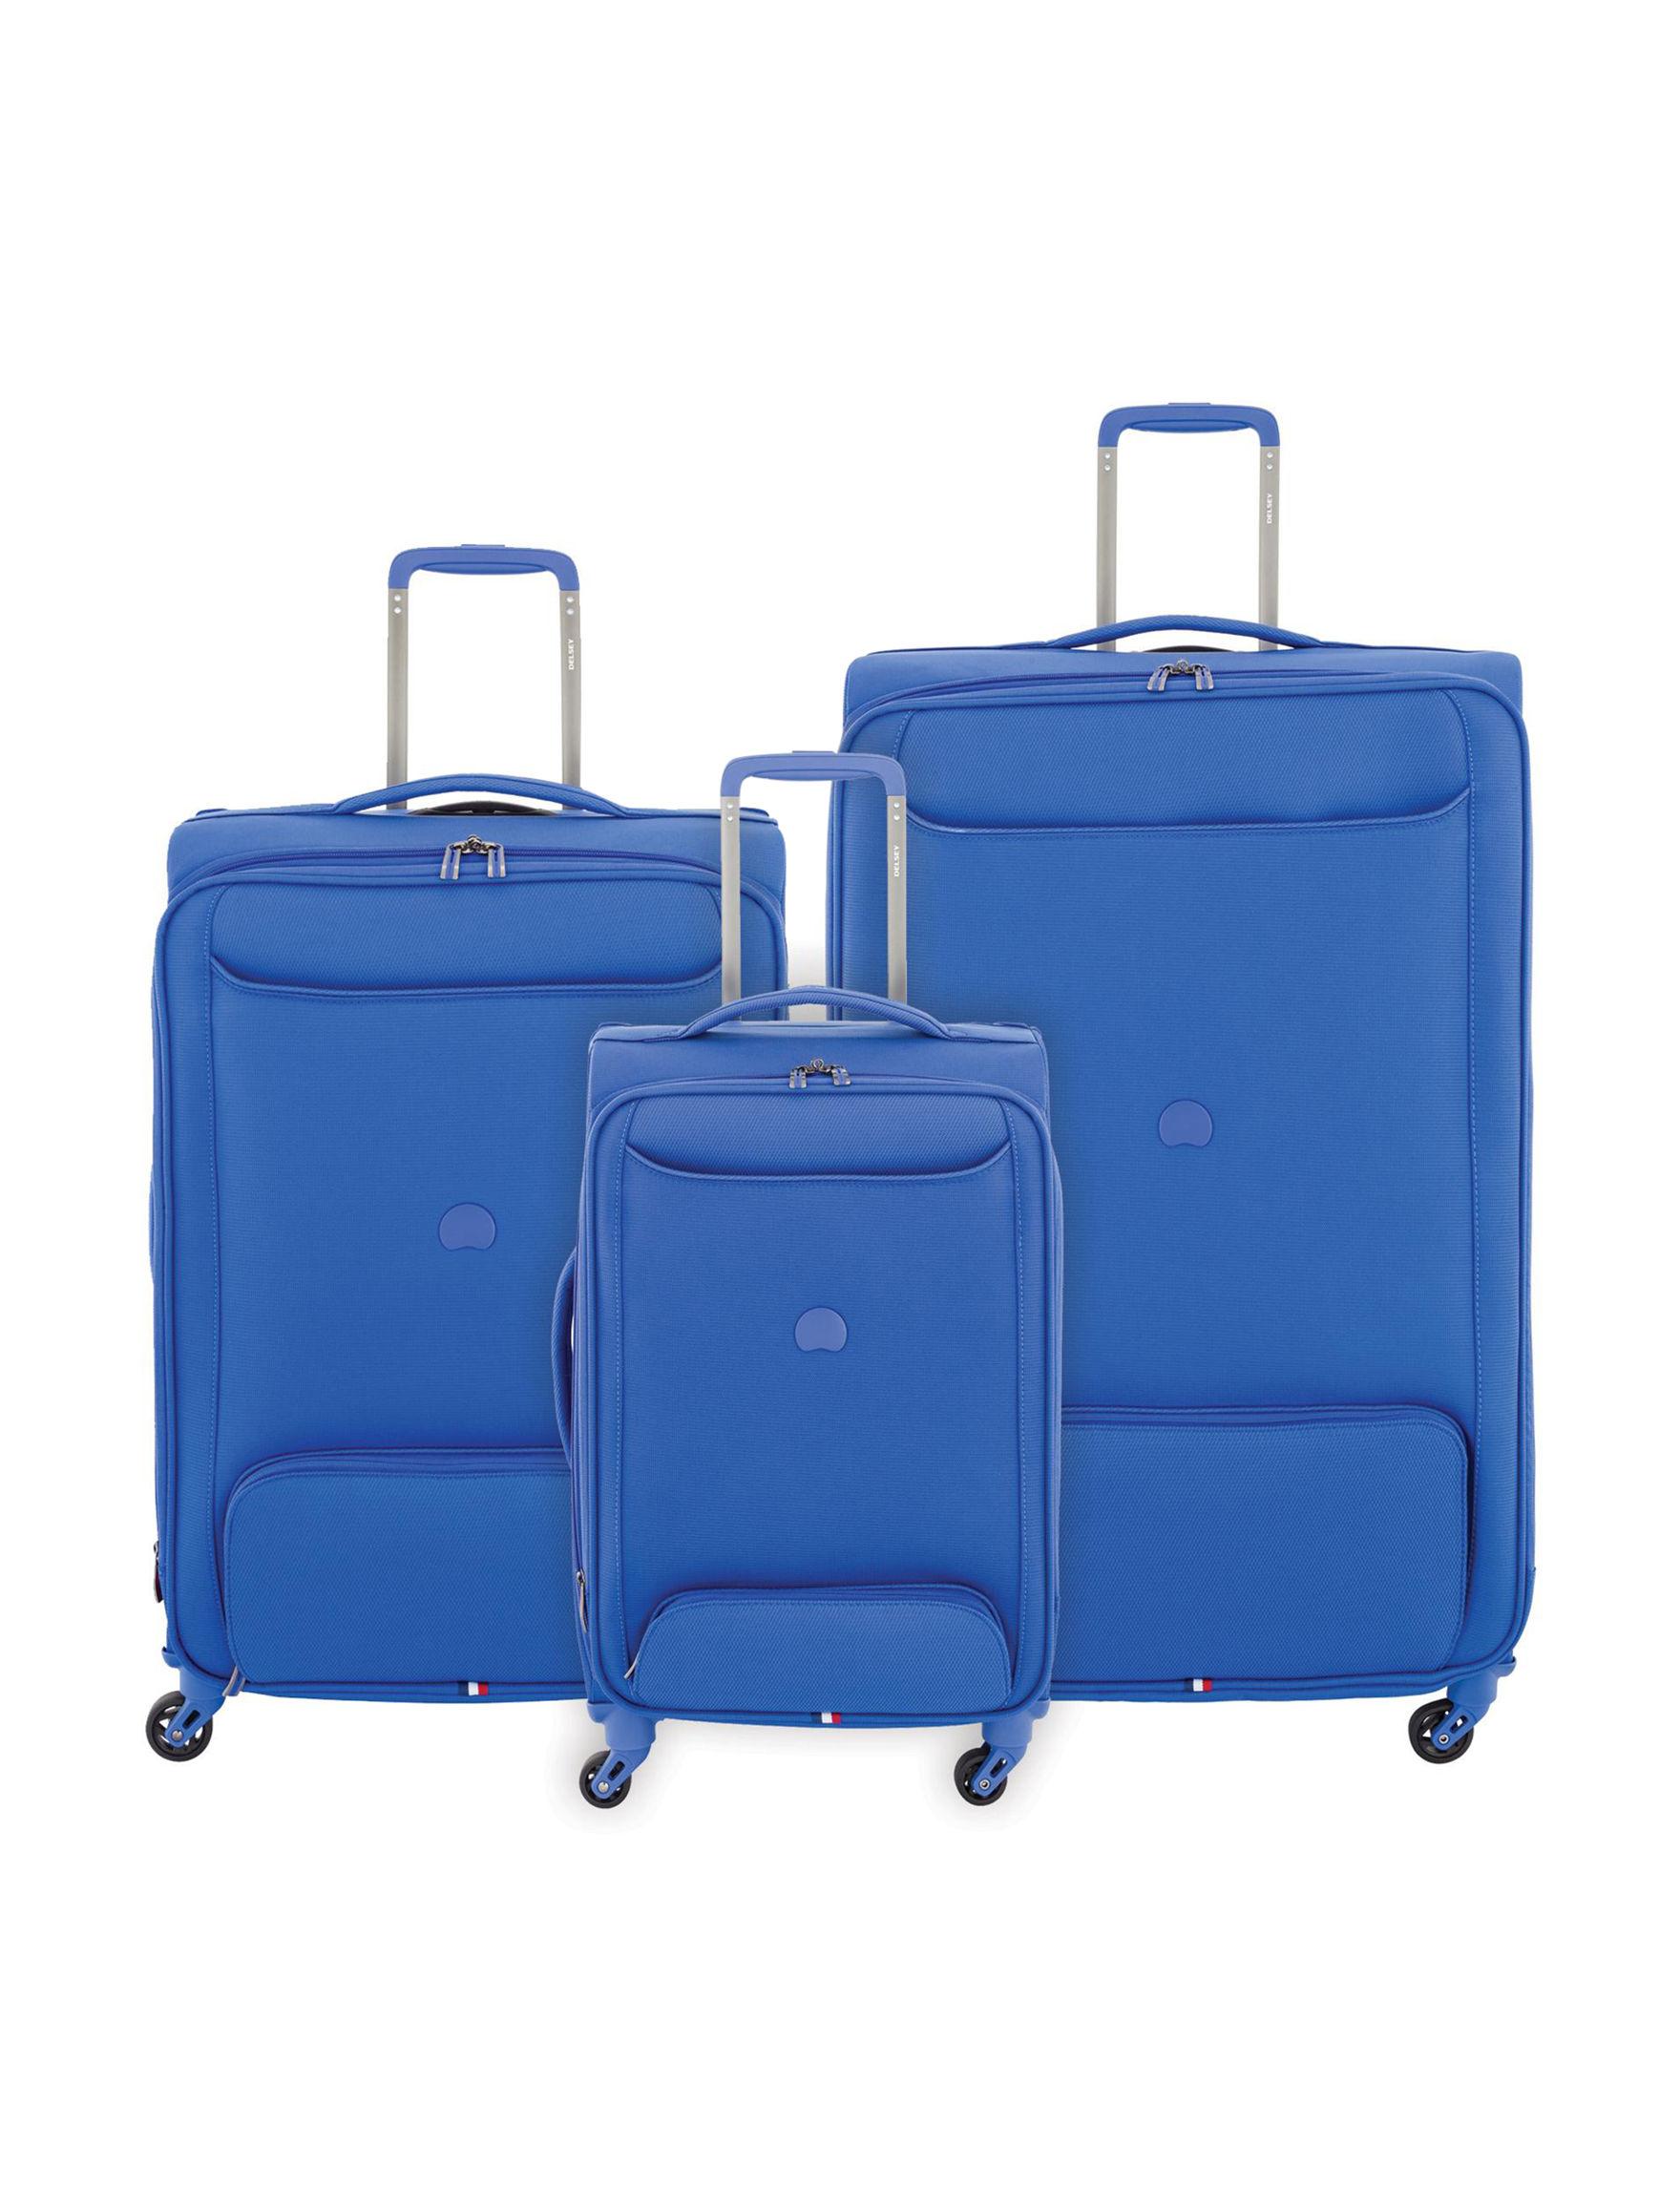 Delsey Blue Luggage Sets